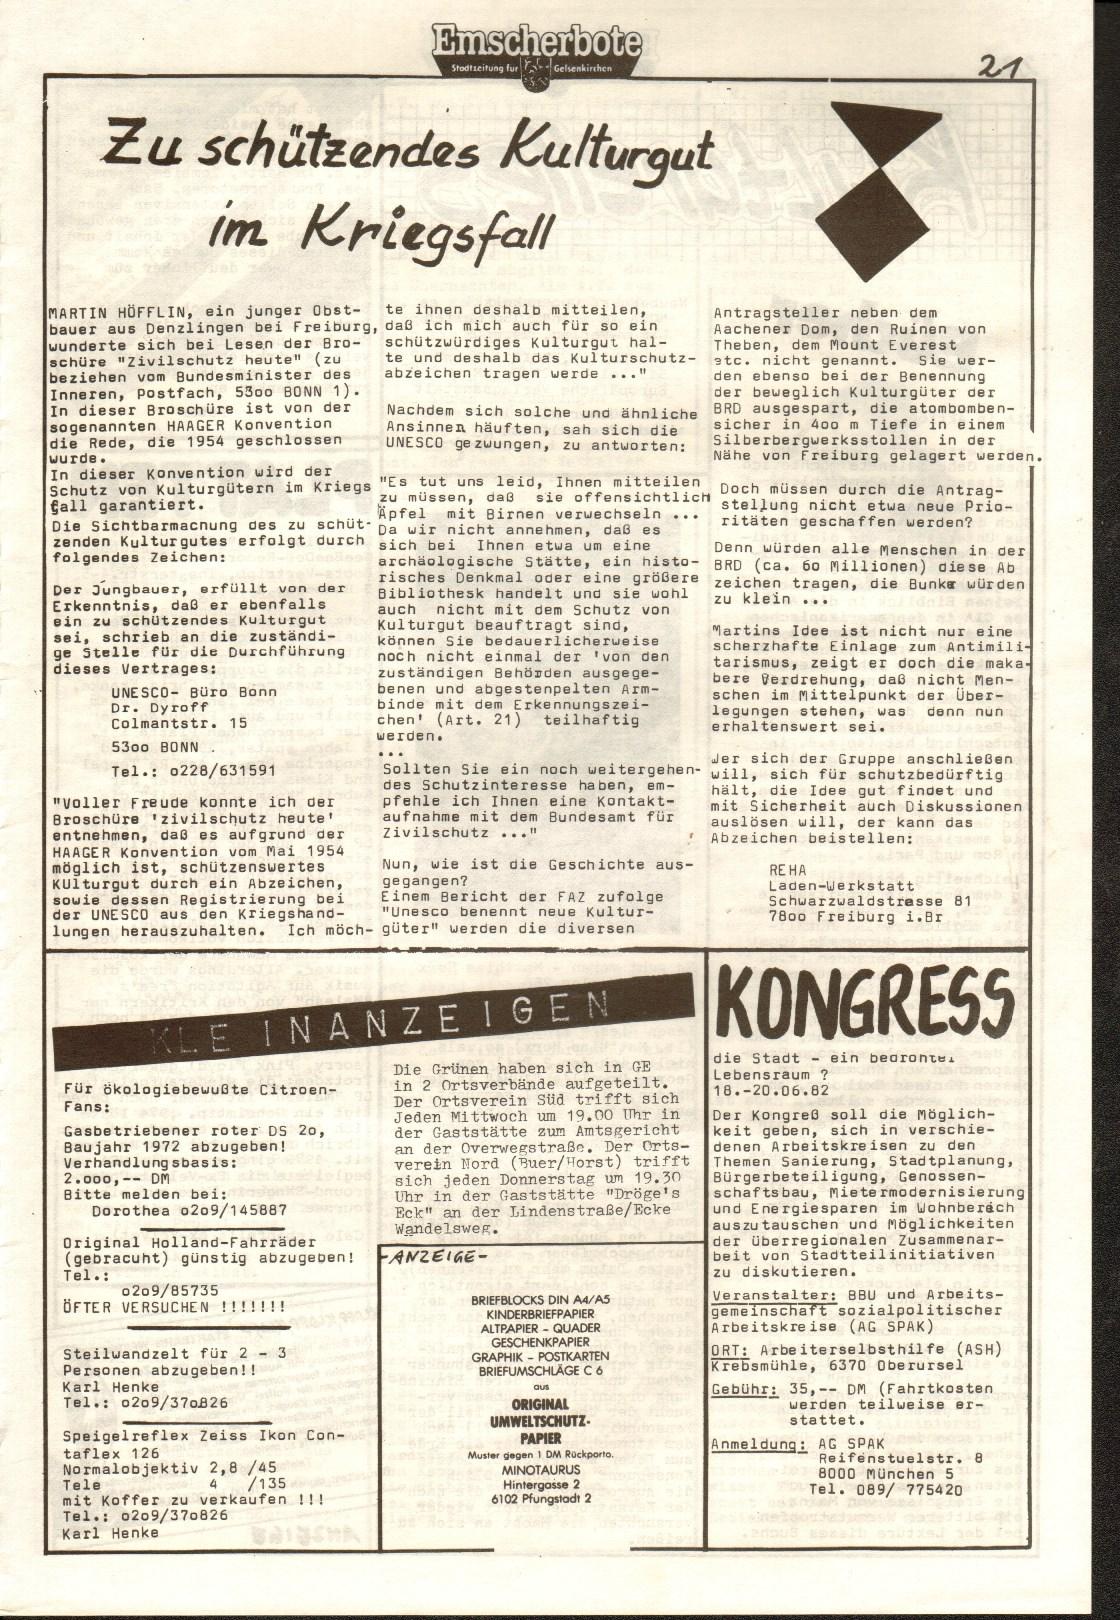 Gelsenkirchen_Emscherbote_1982_18_21